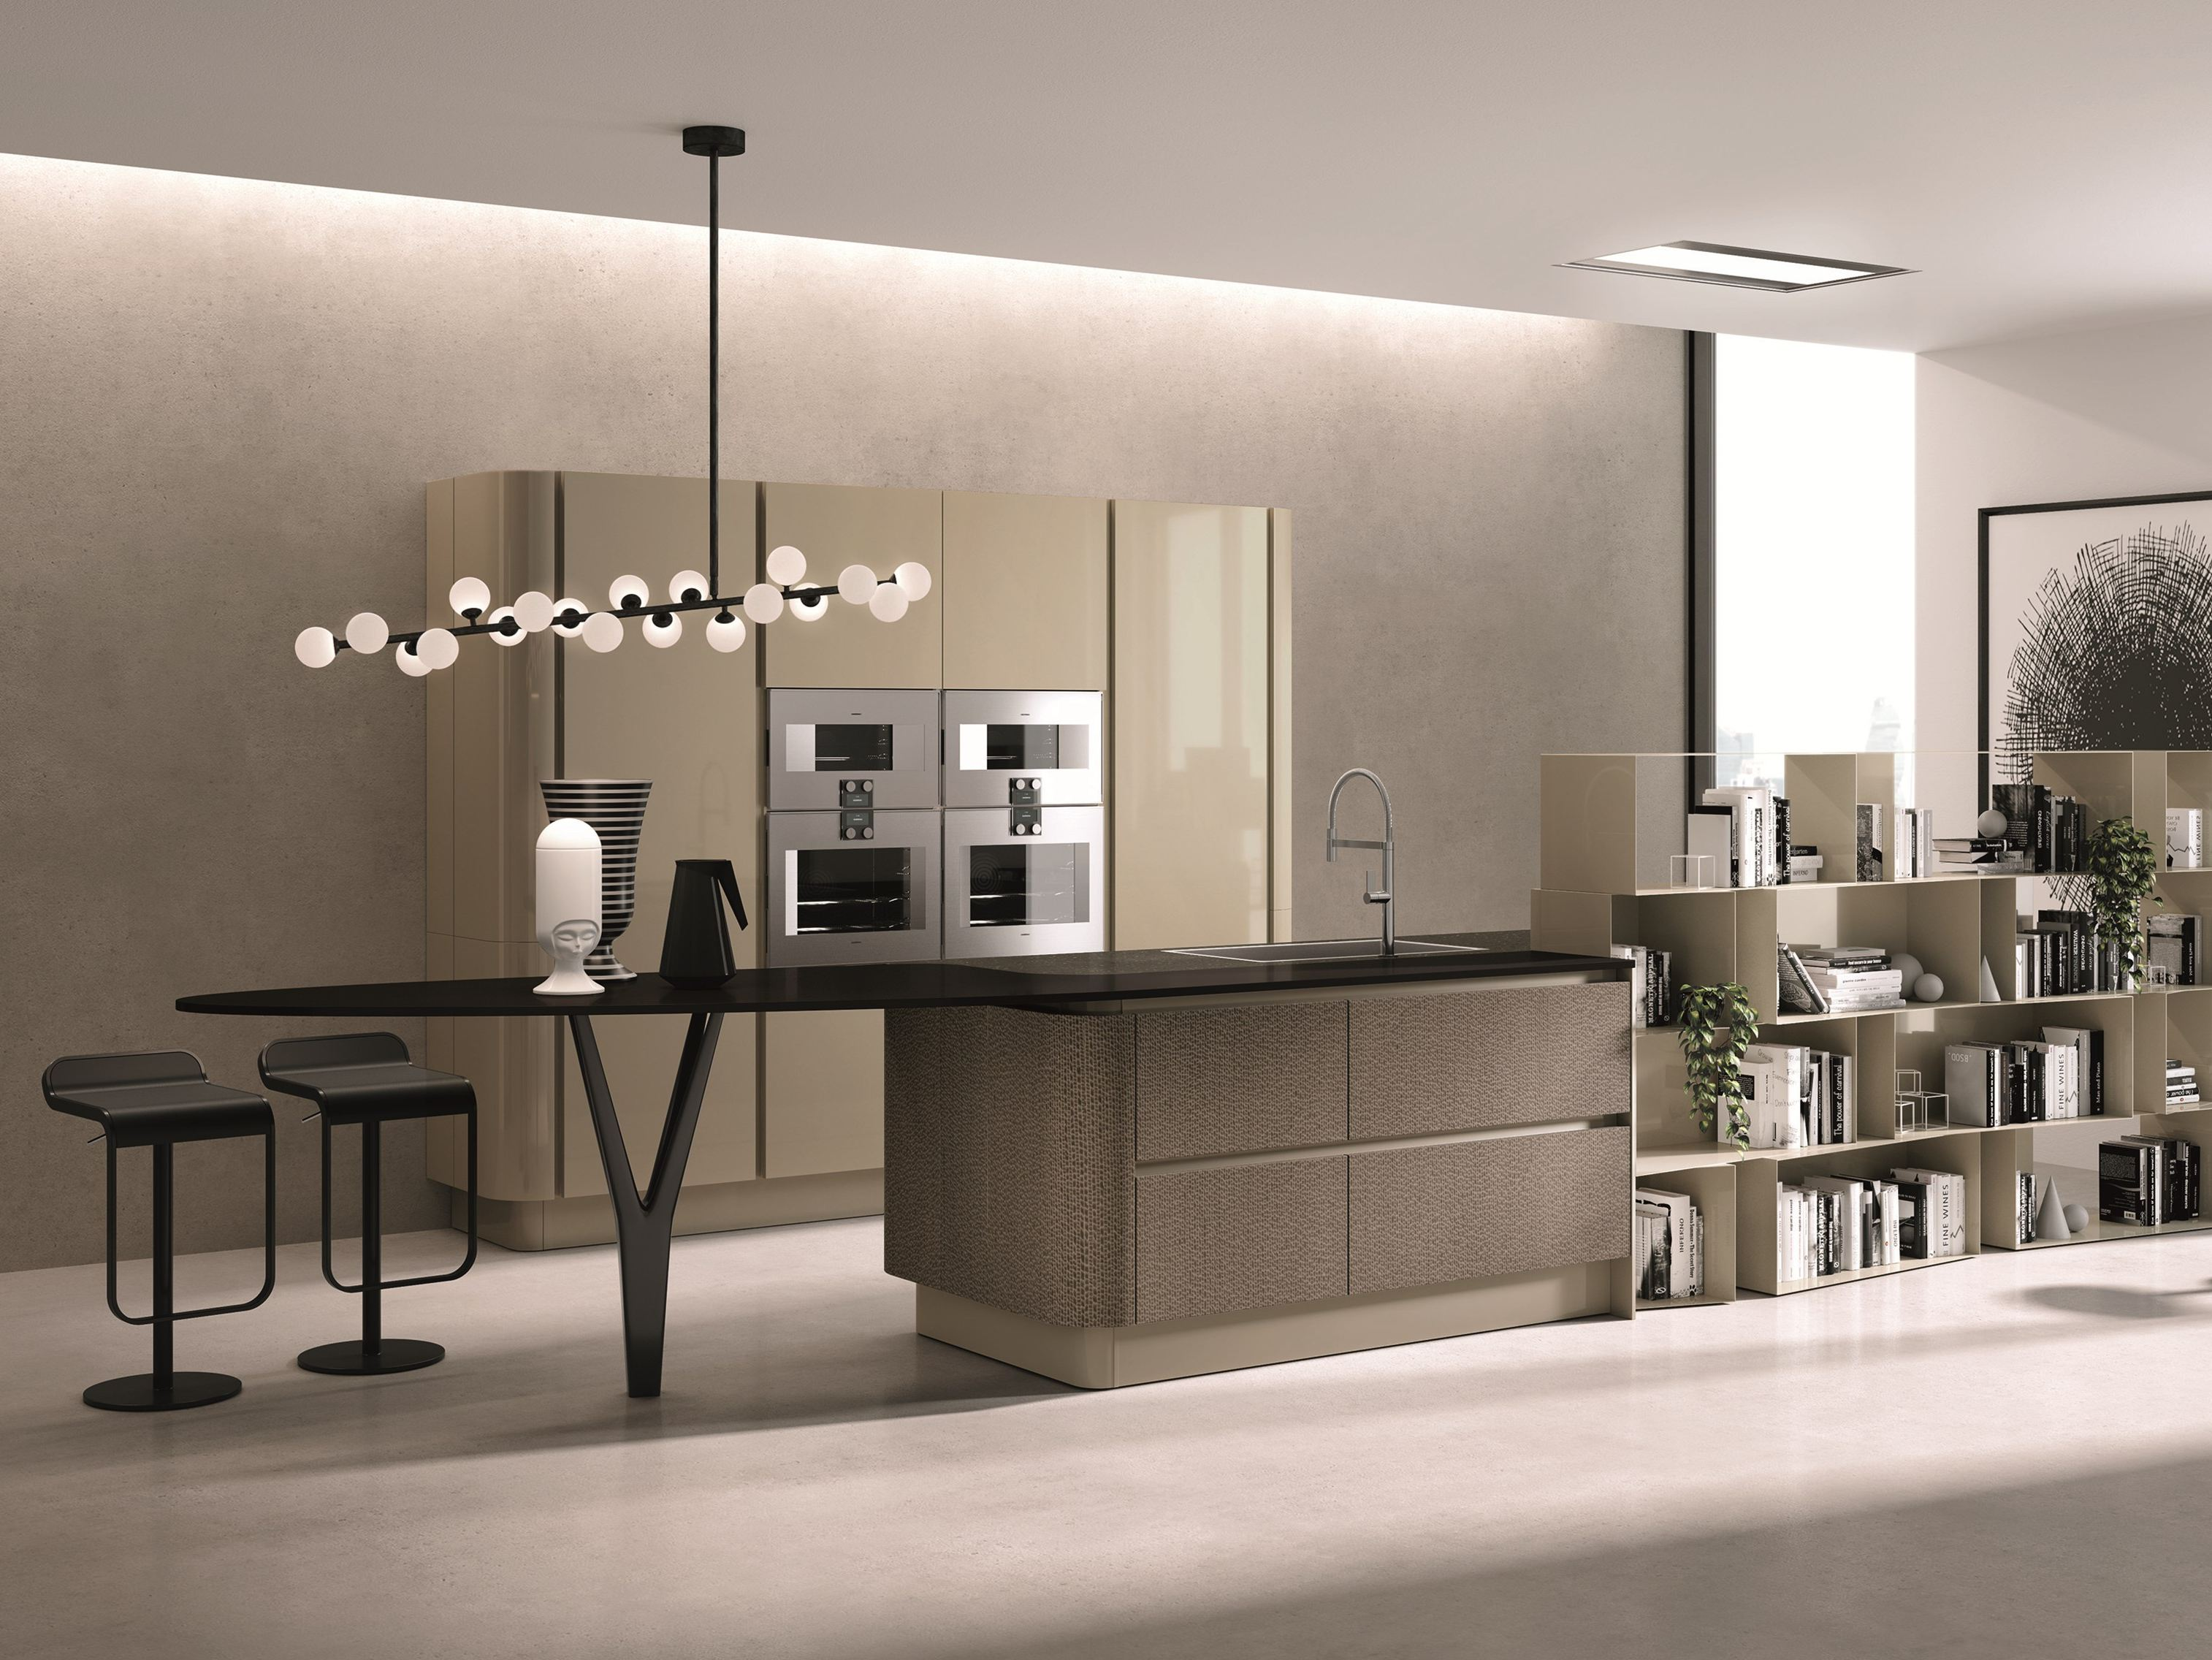 Domina cucina con isola by aster cucine design lorenzo for Isola cucina design